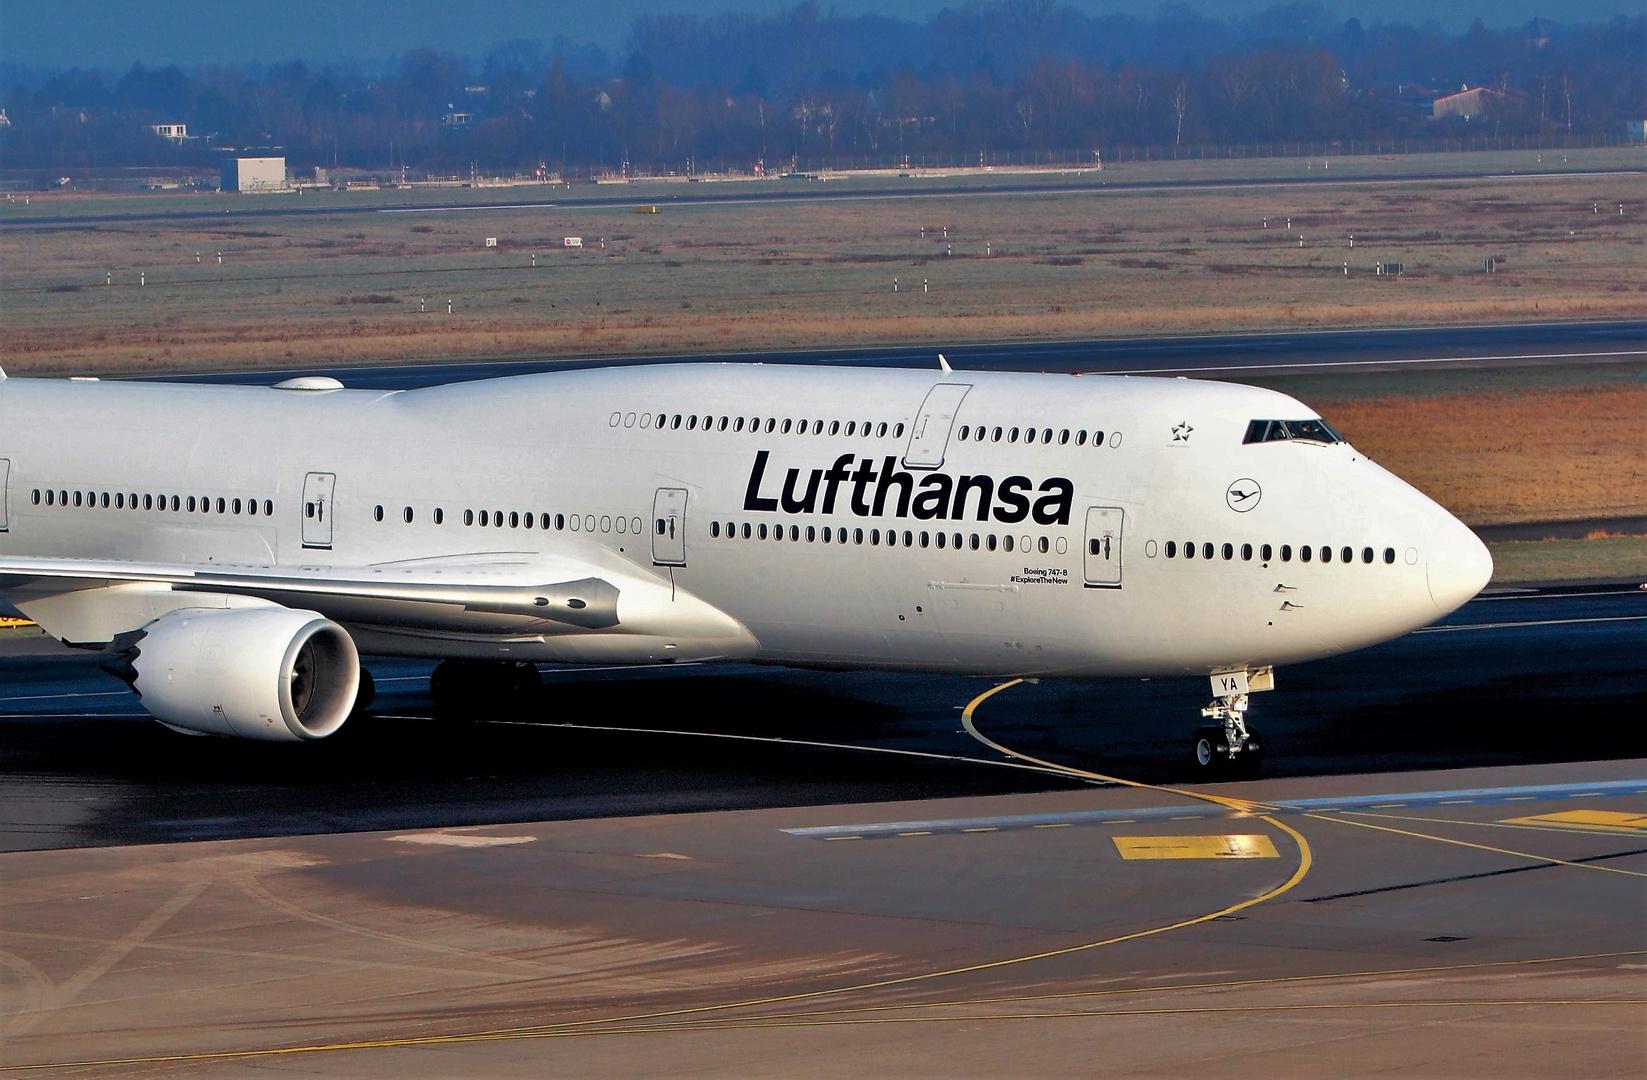 747 in Düsseldorf